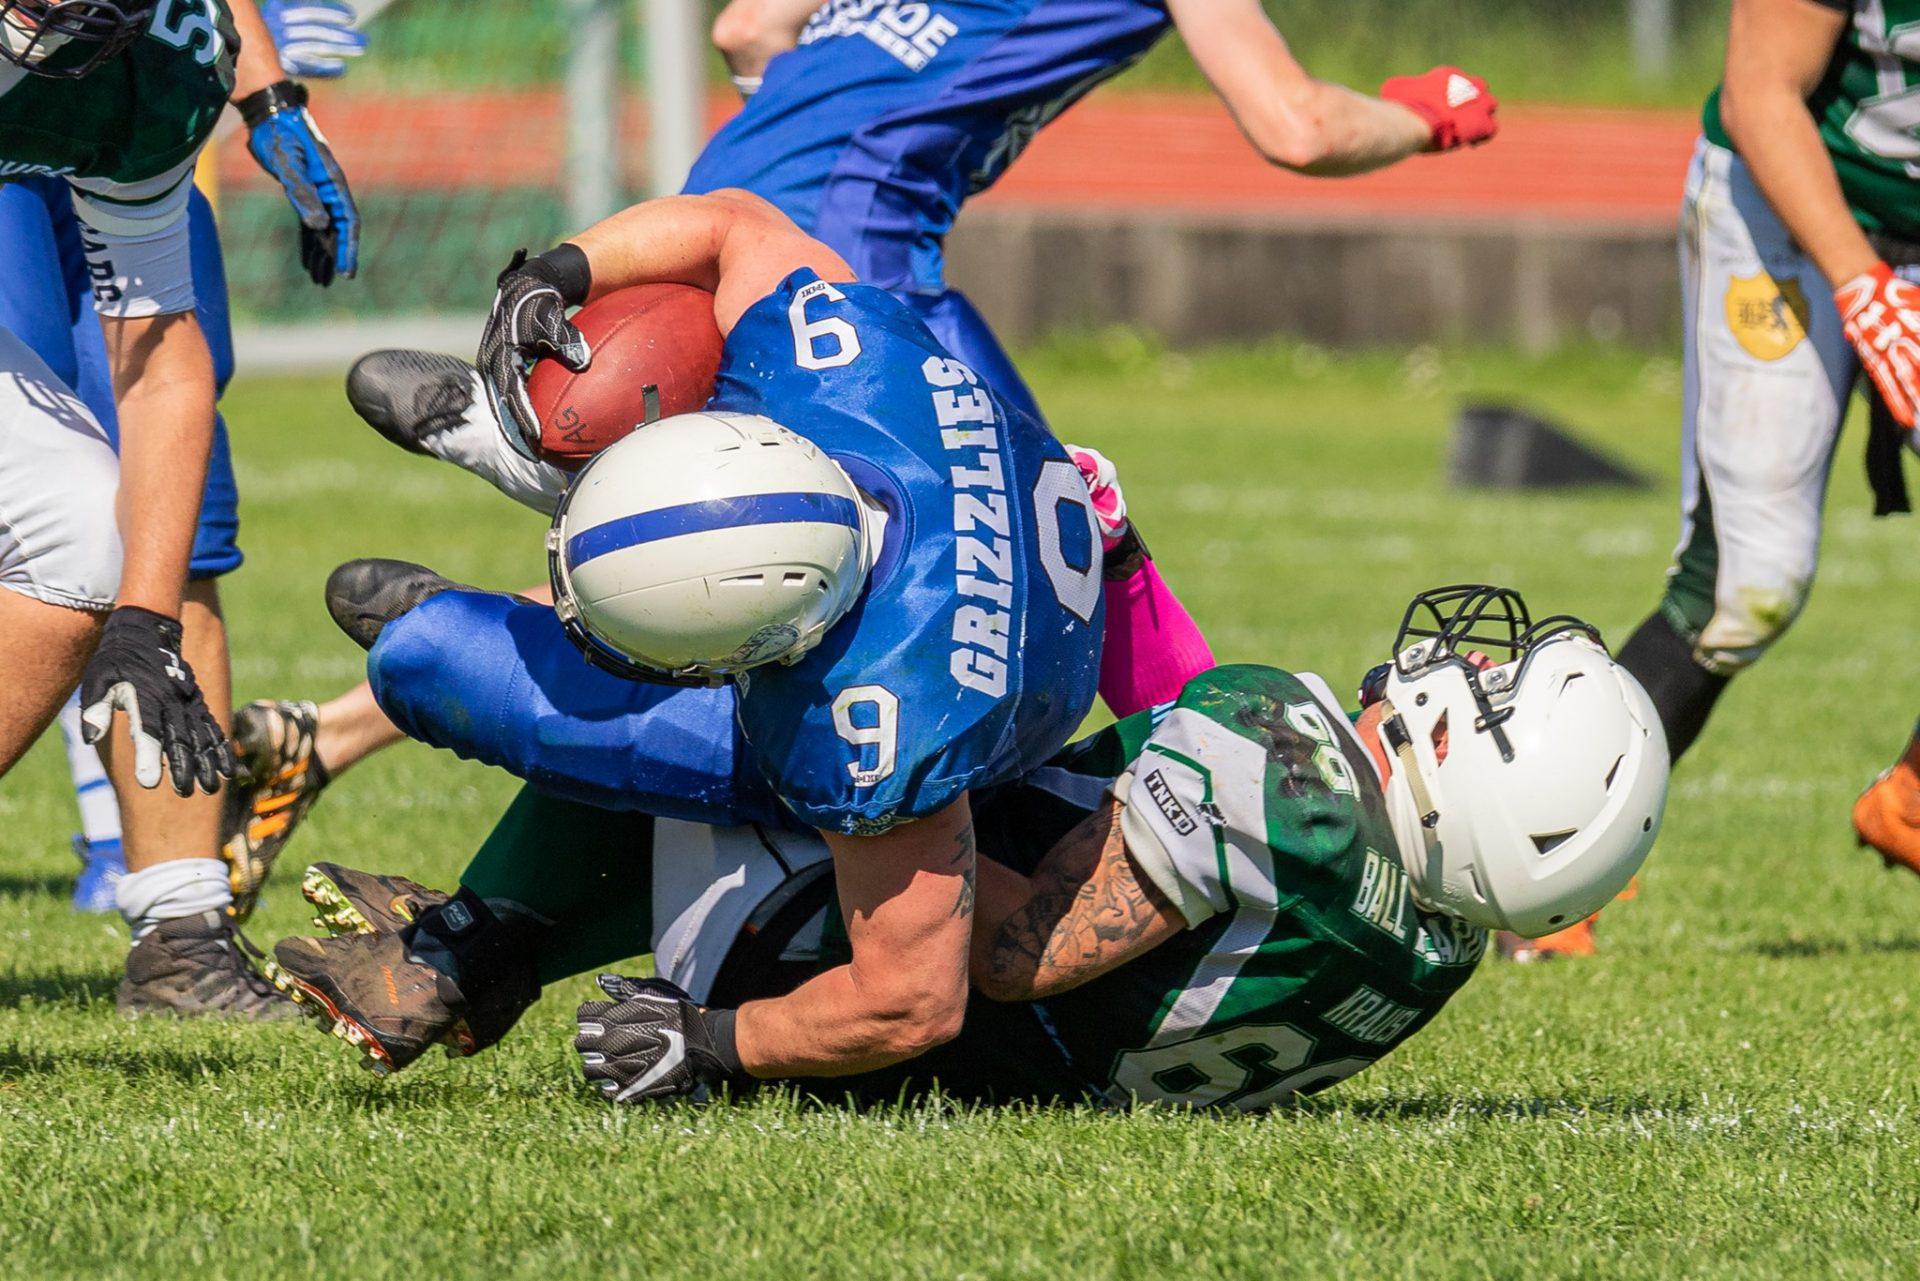 Sportfotografie - American Football